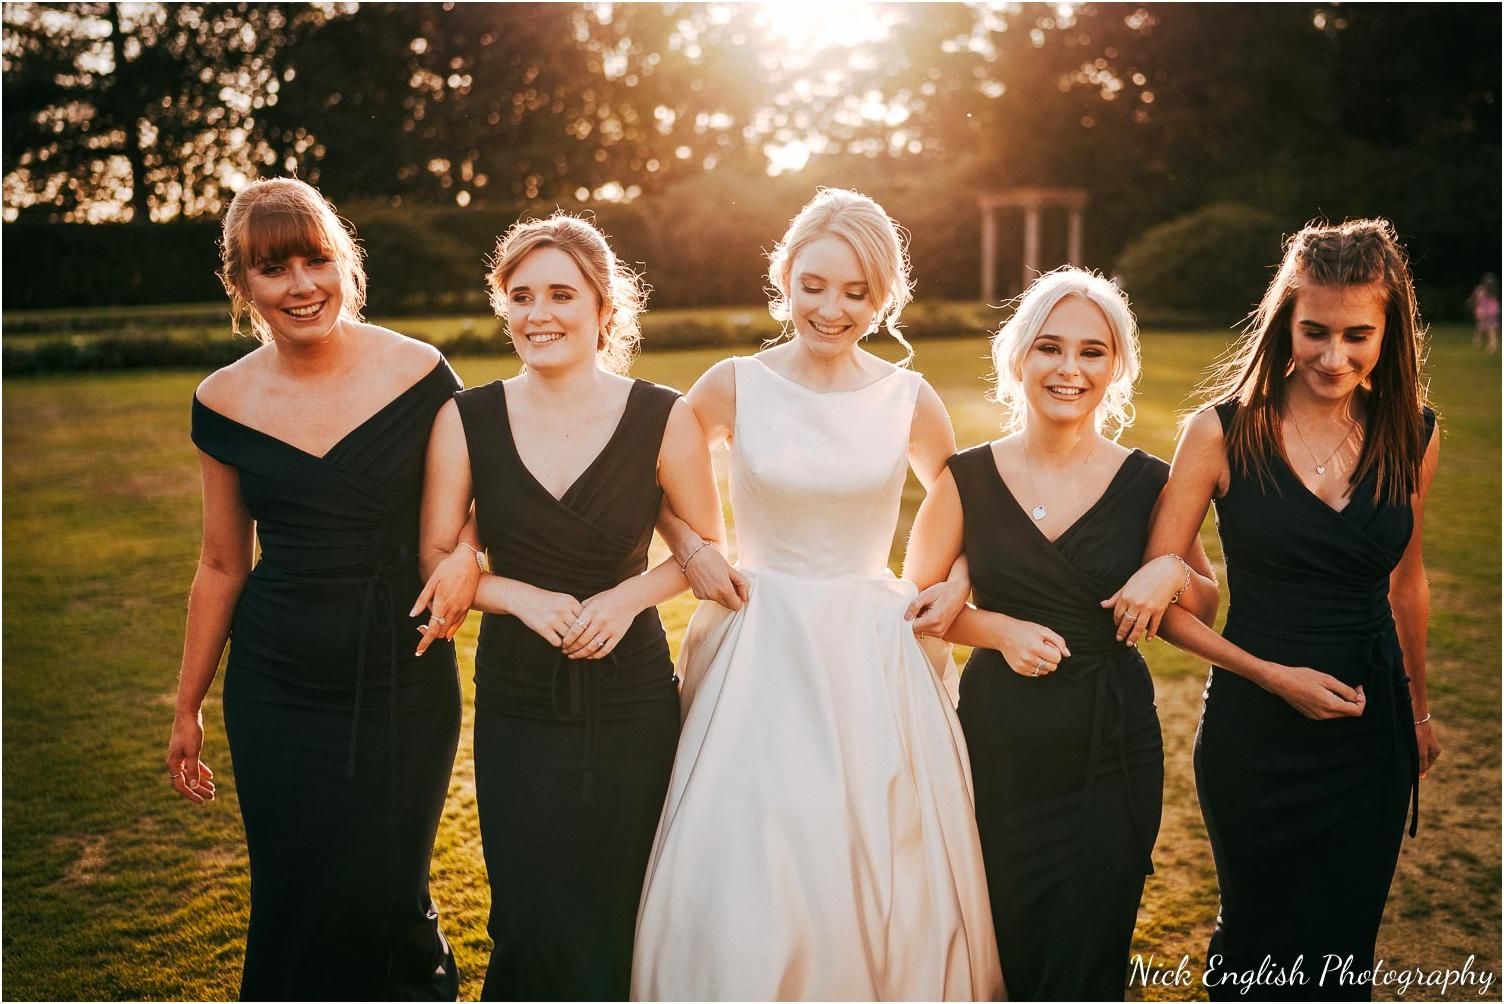 Eaves_Hall_Outdoor_Wedding_Photograph-82.jpg